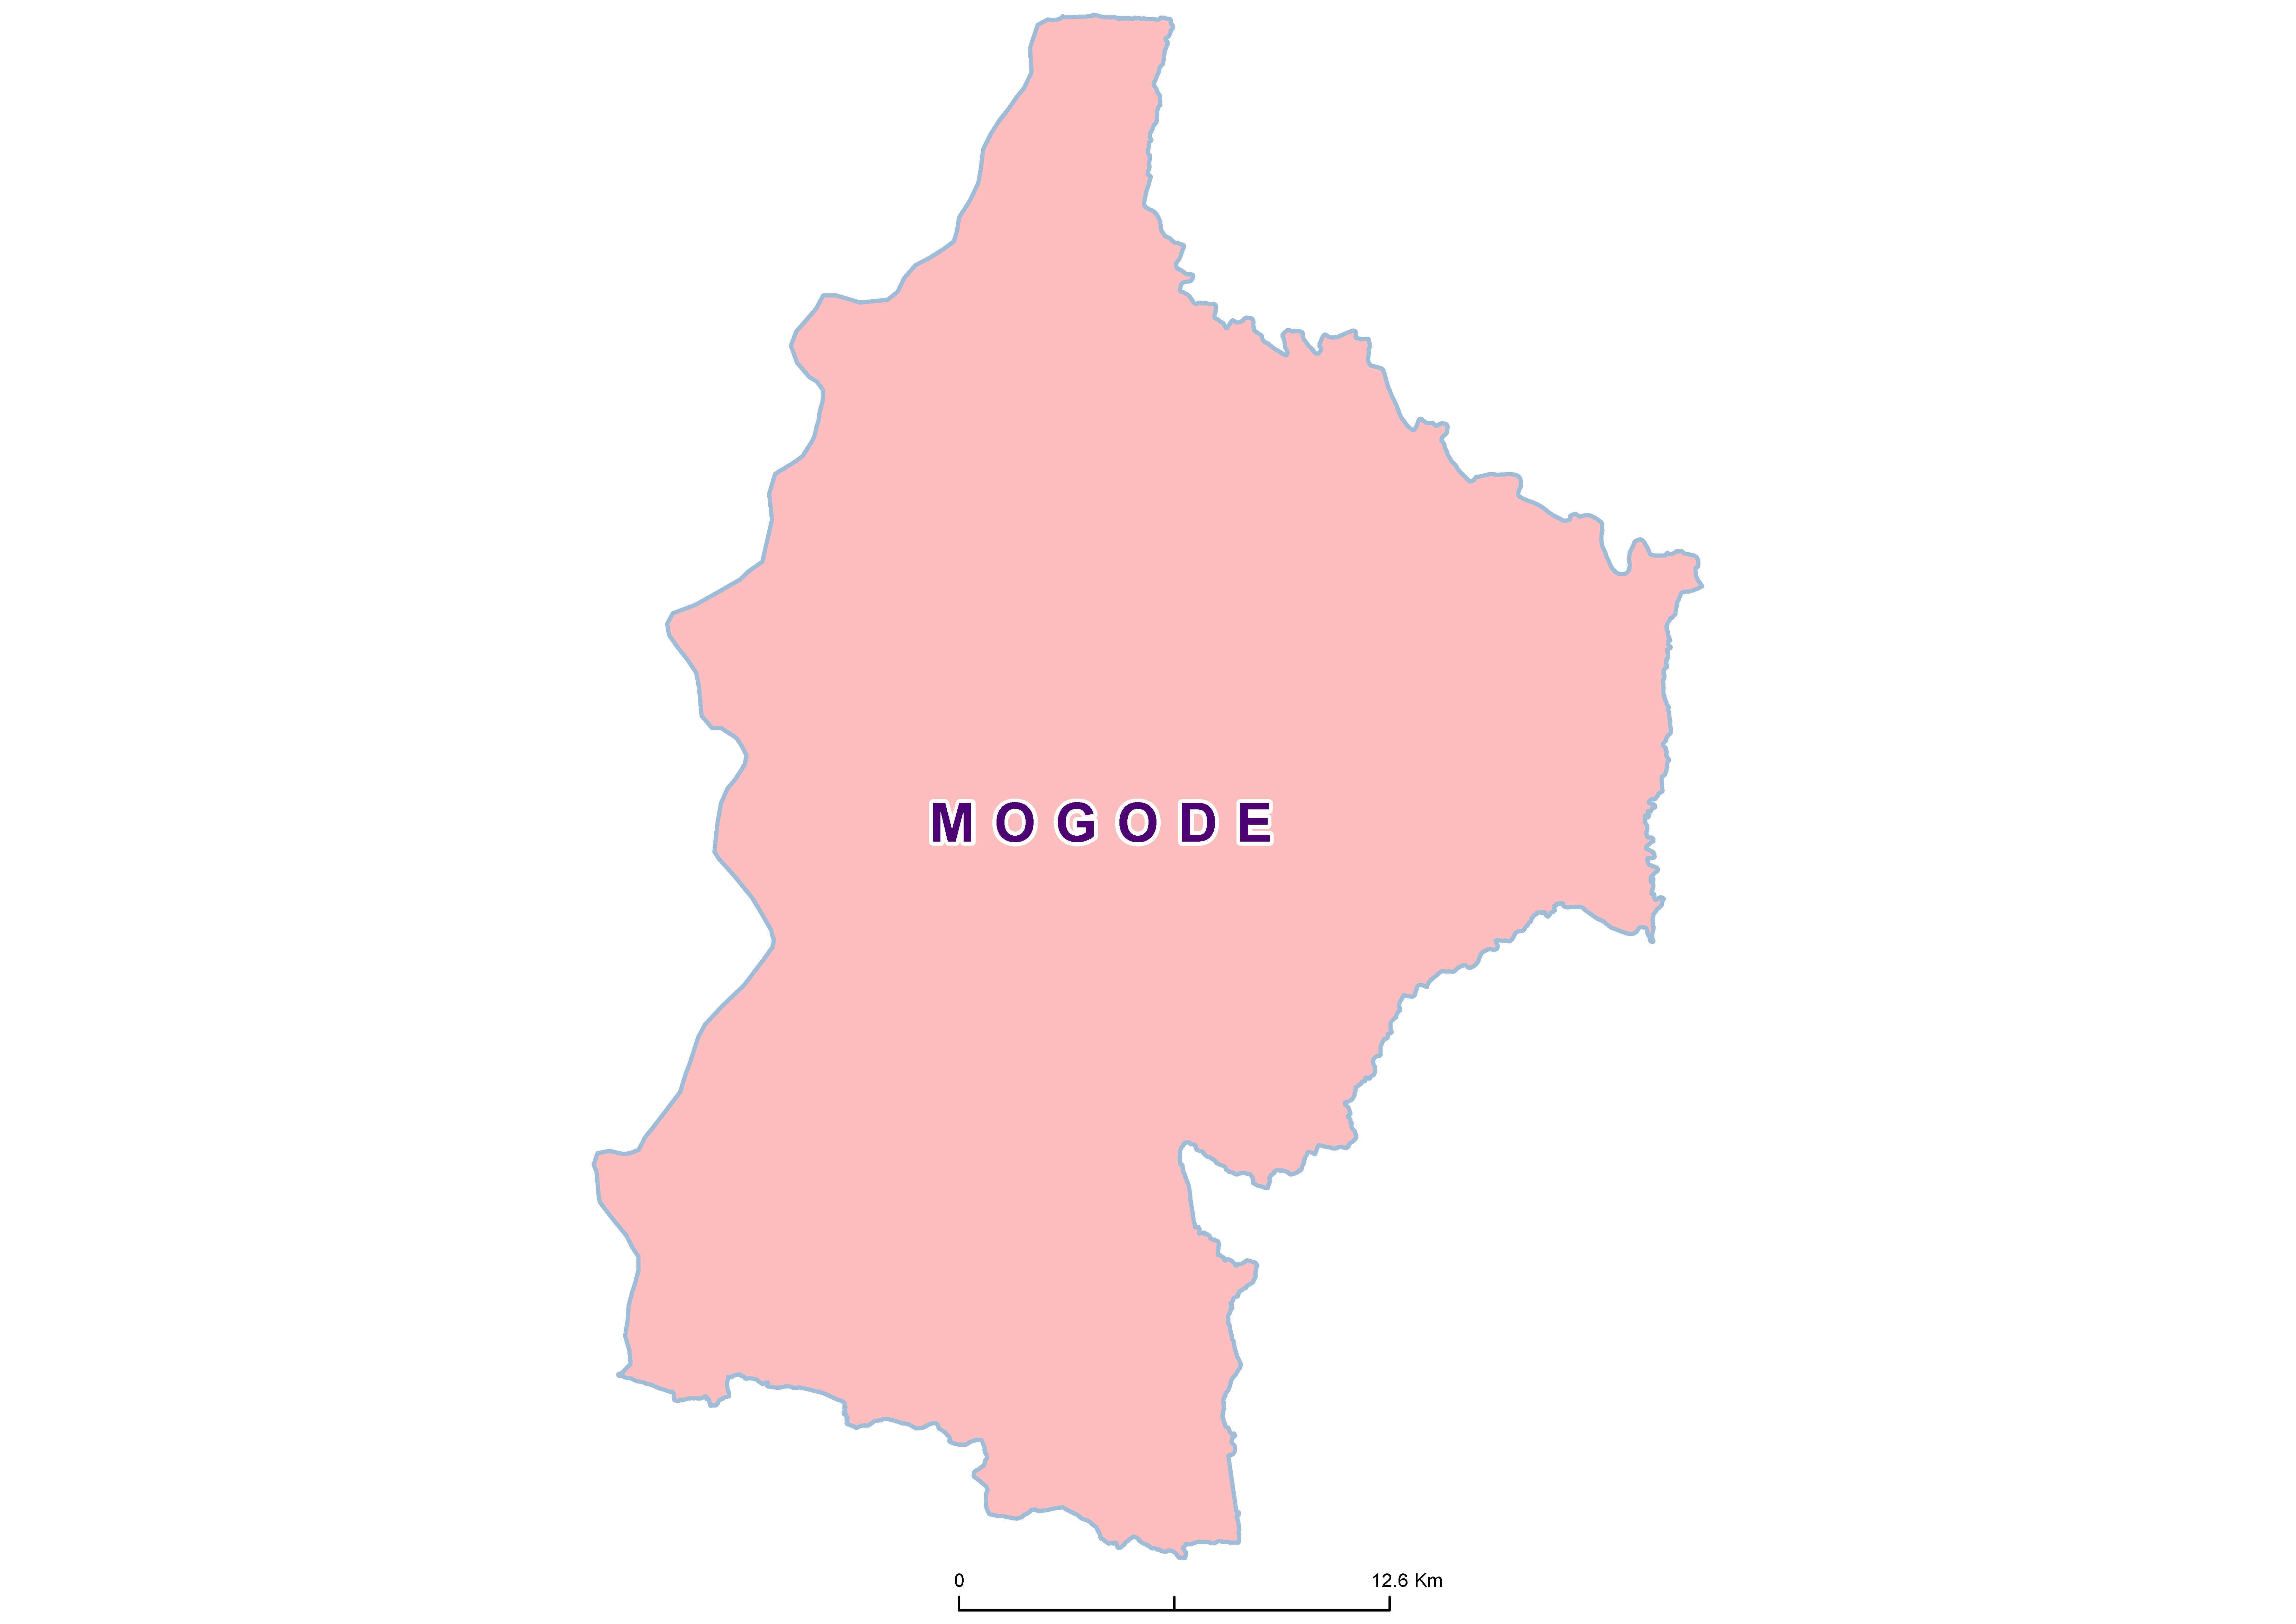 Mogode Mean STH 19850001